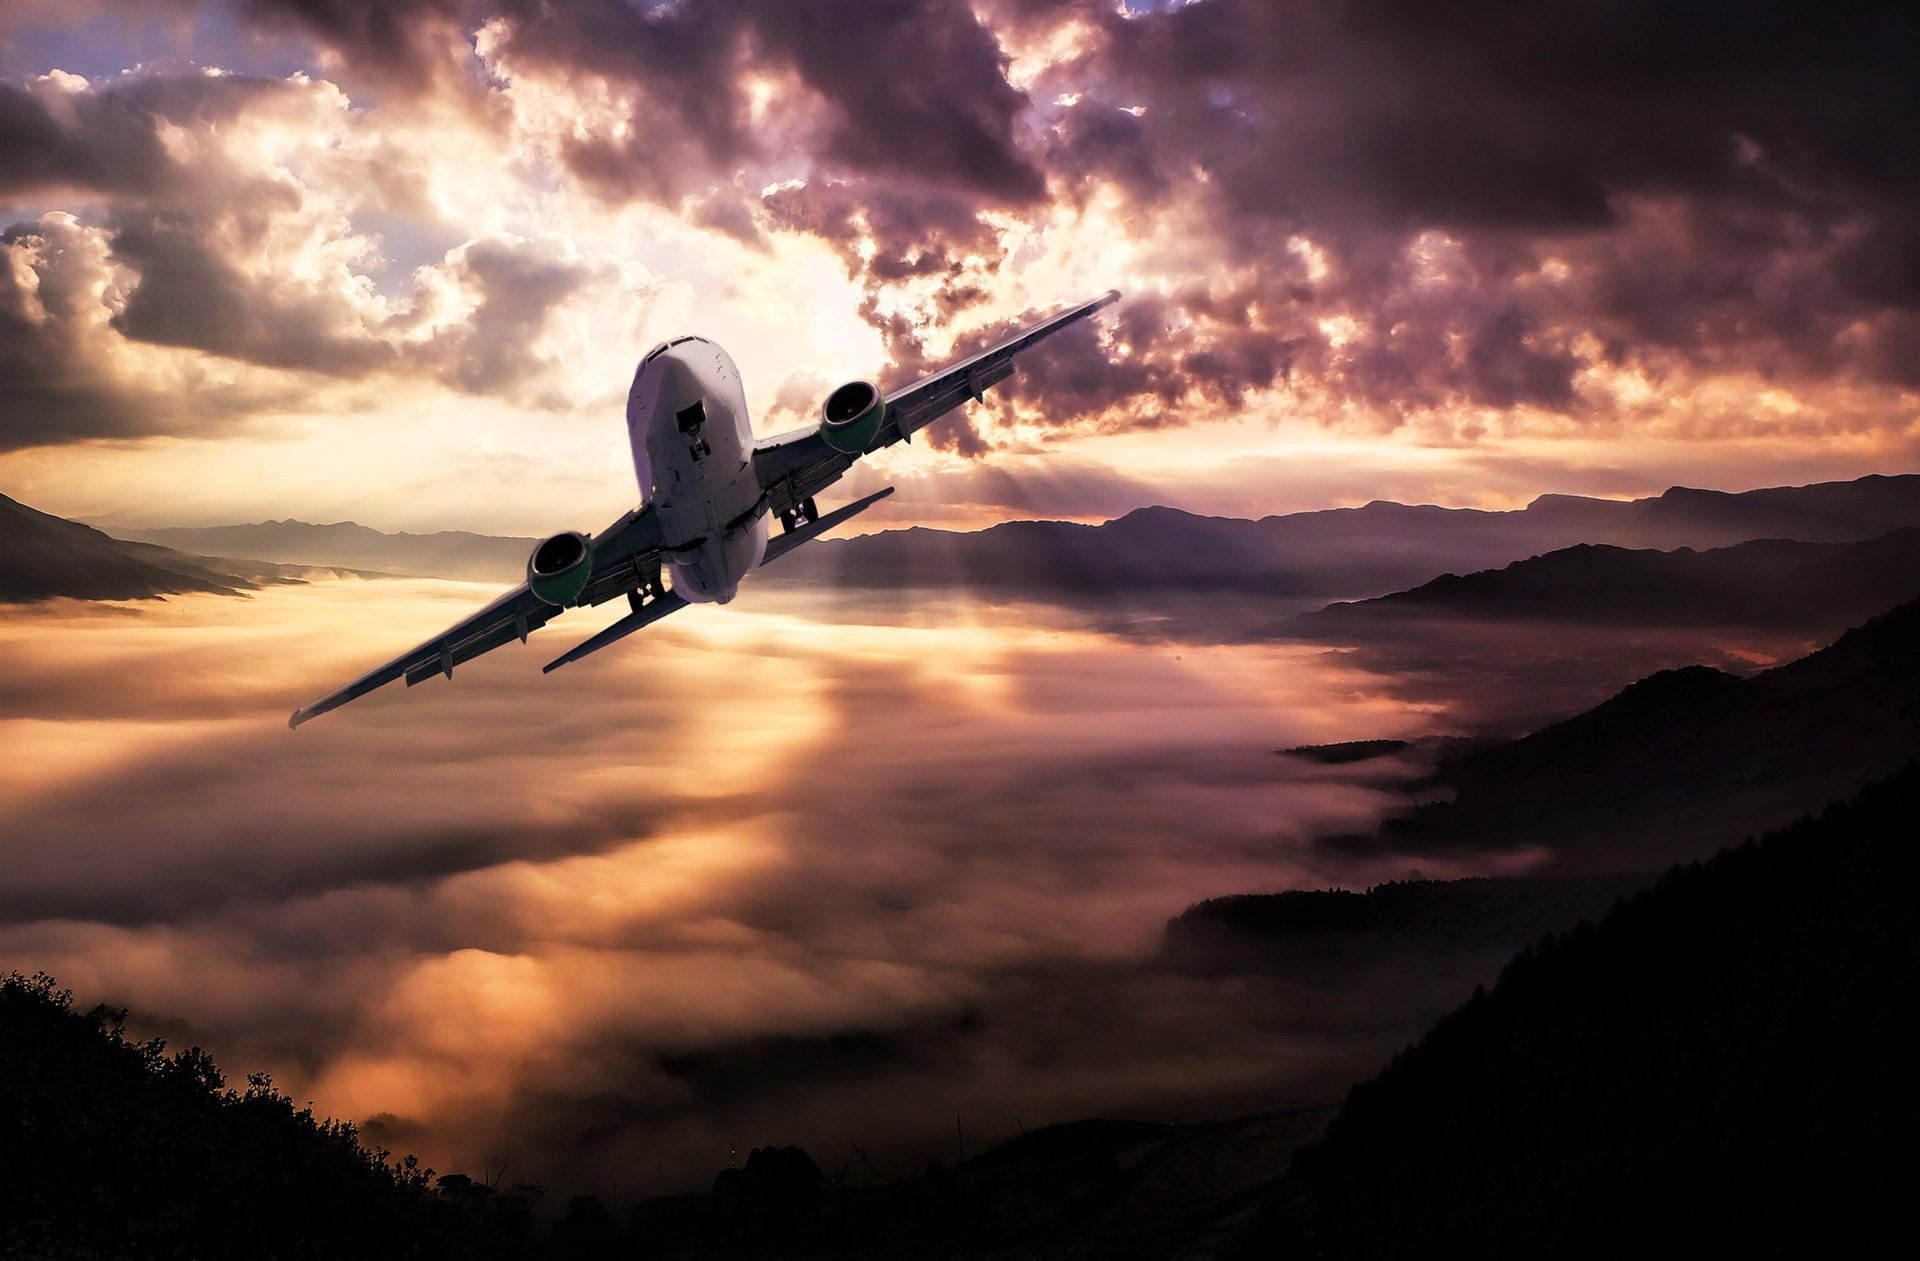 aircraft image 2.jpeg